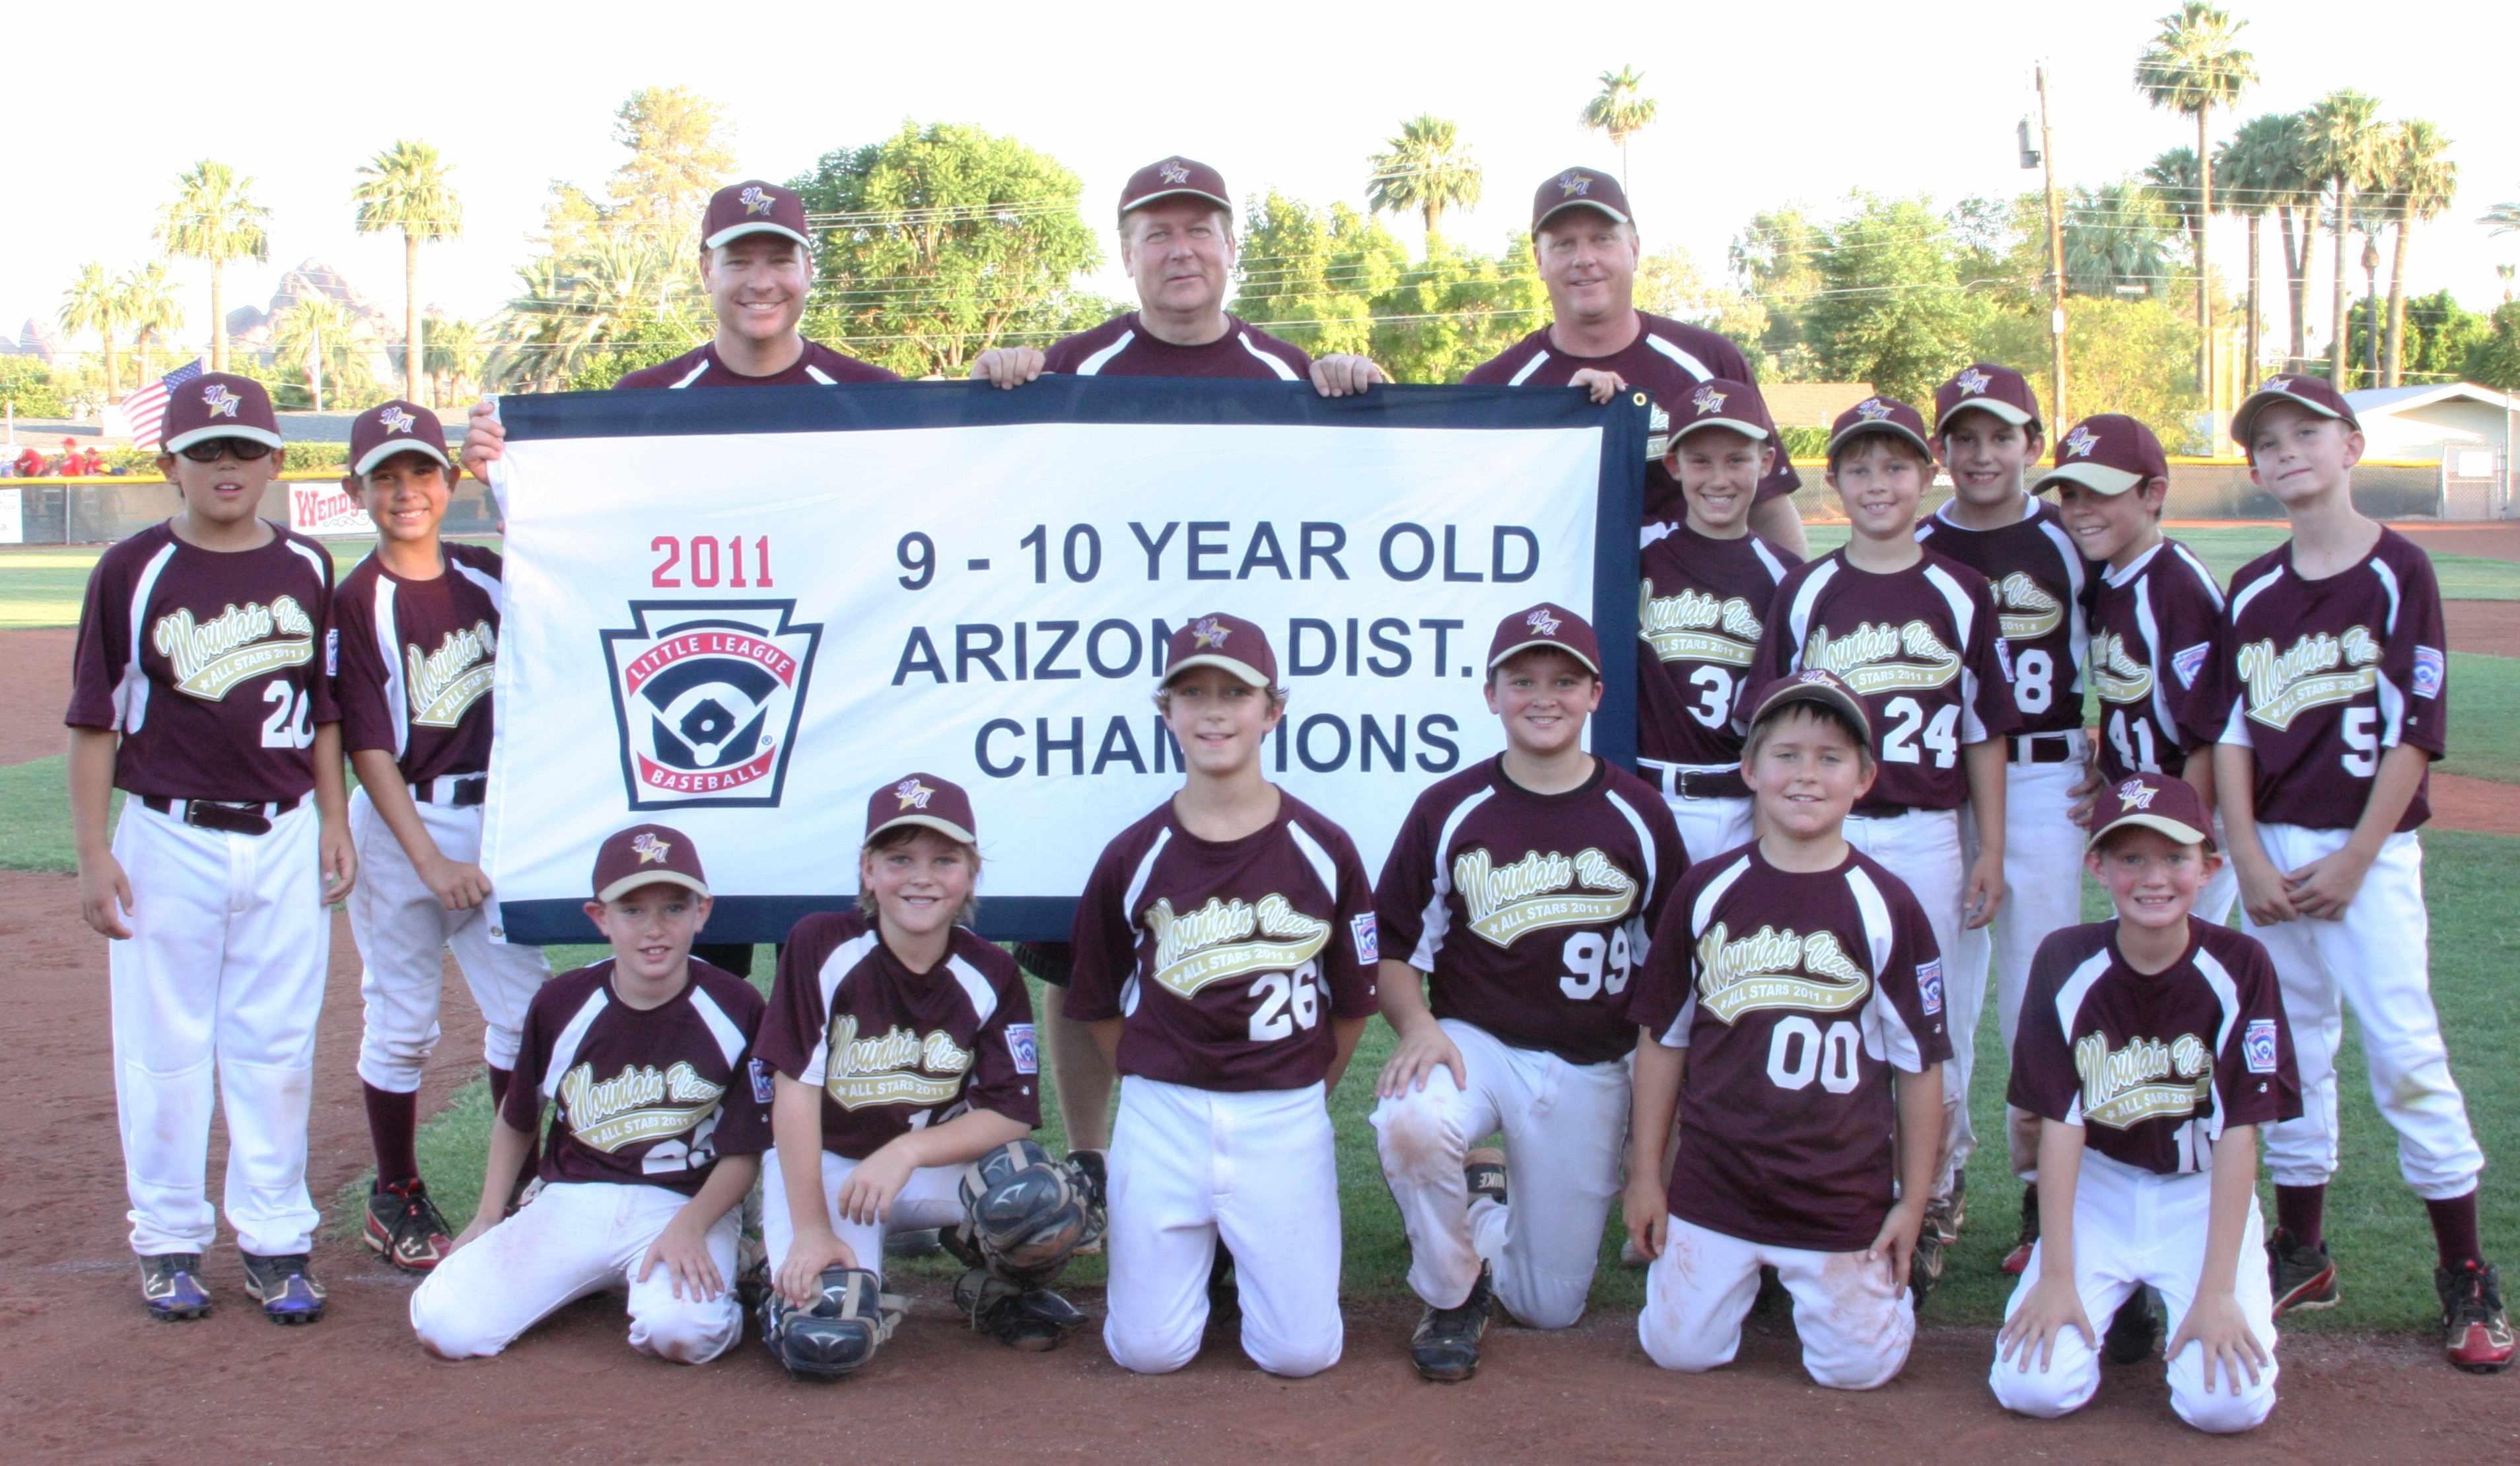 MVLL 2011 AZ6 9-10 baseball champs.jpg